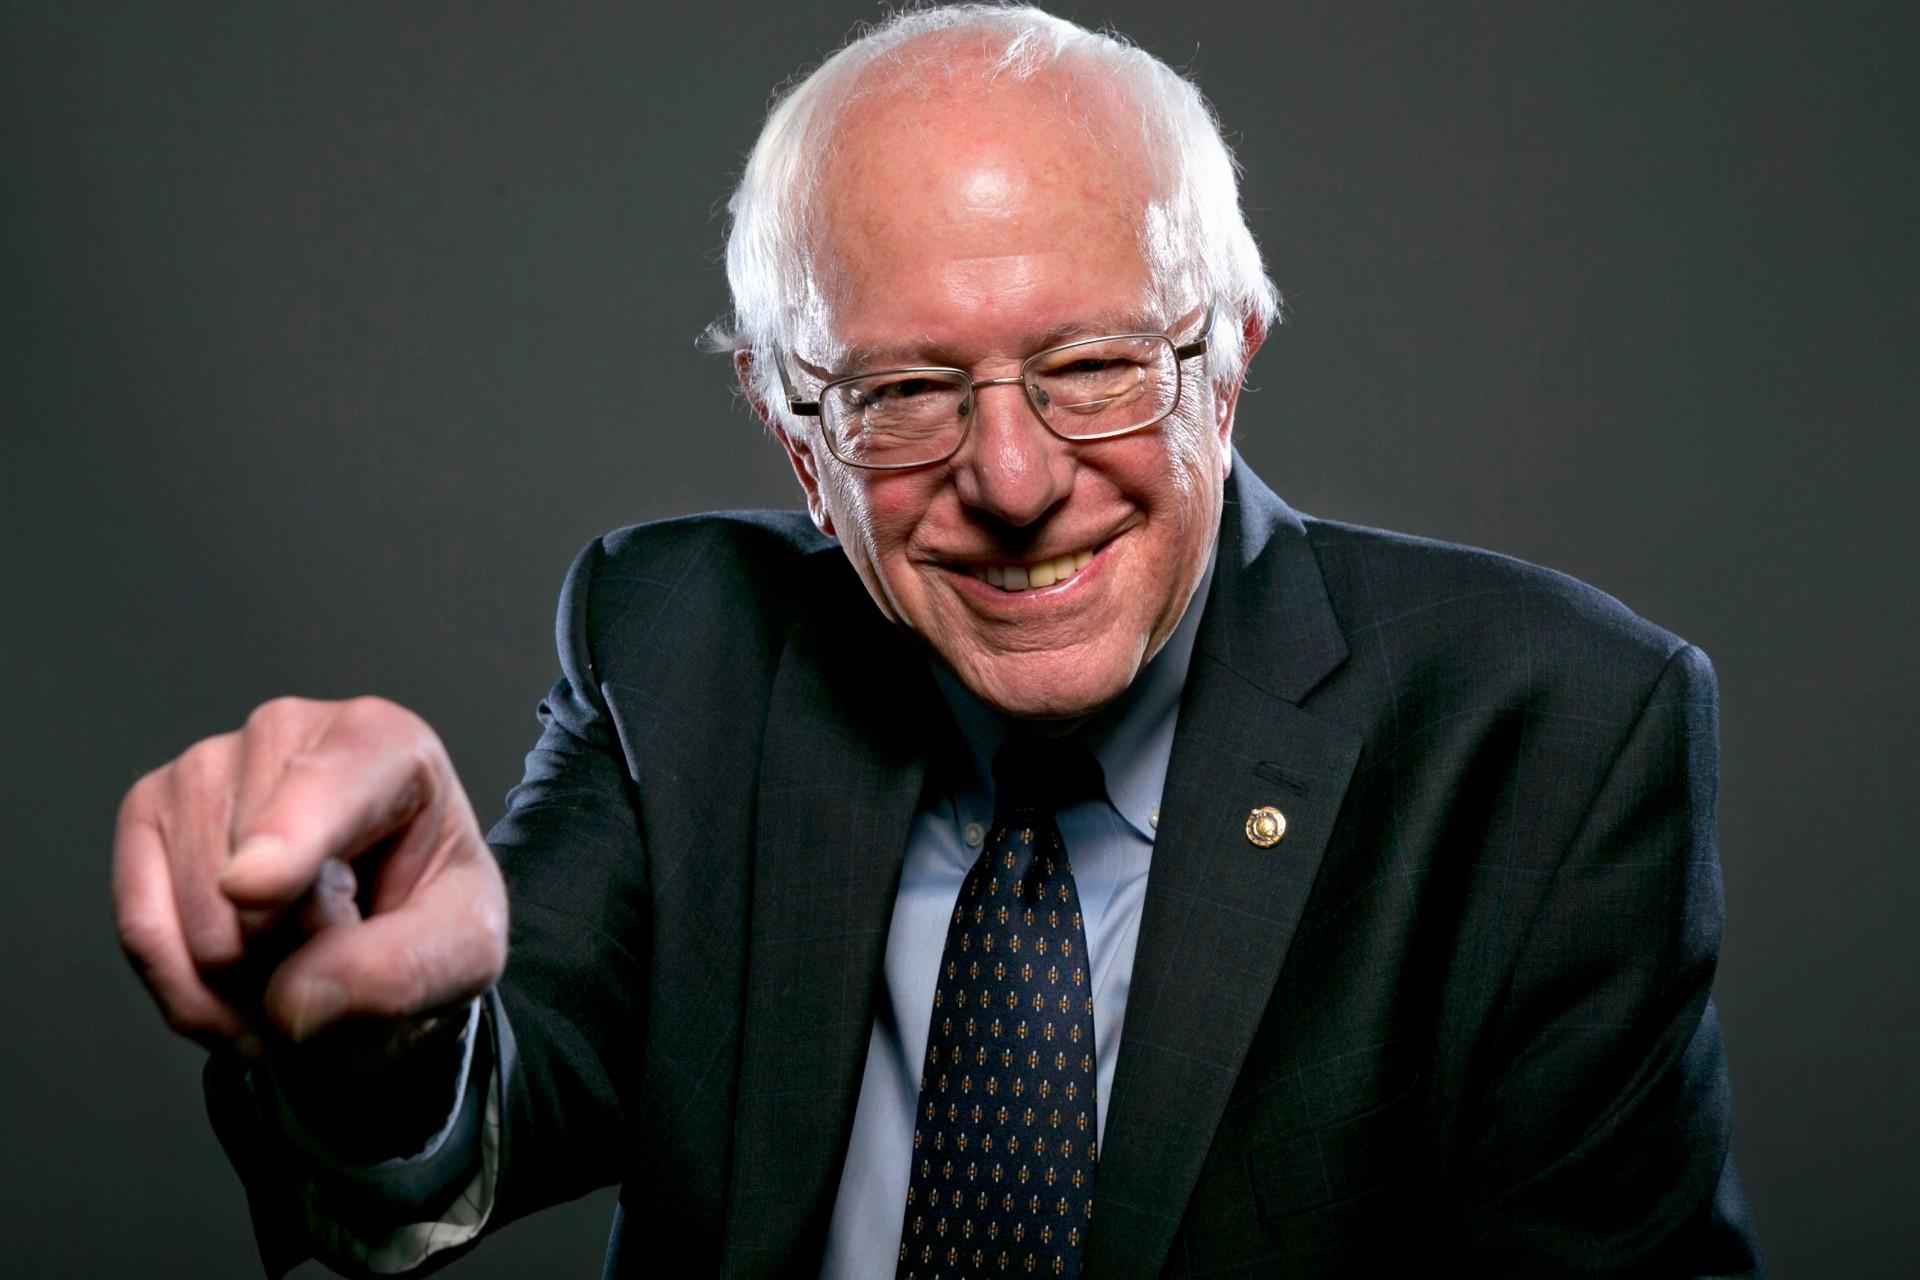 013 Bernie Sanders Rape Essay Dem 2016 Sandersquality90stripall Phenomenal 1920